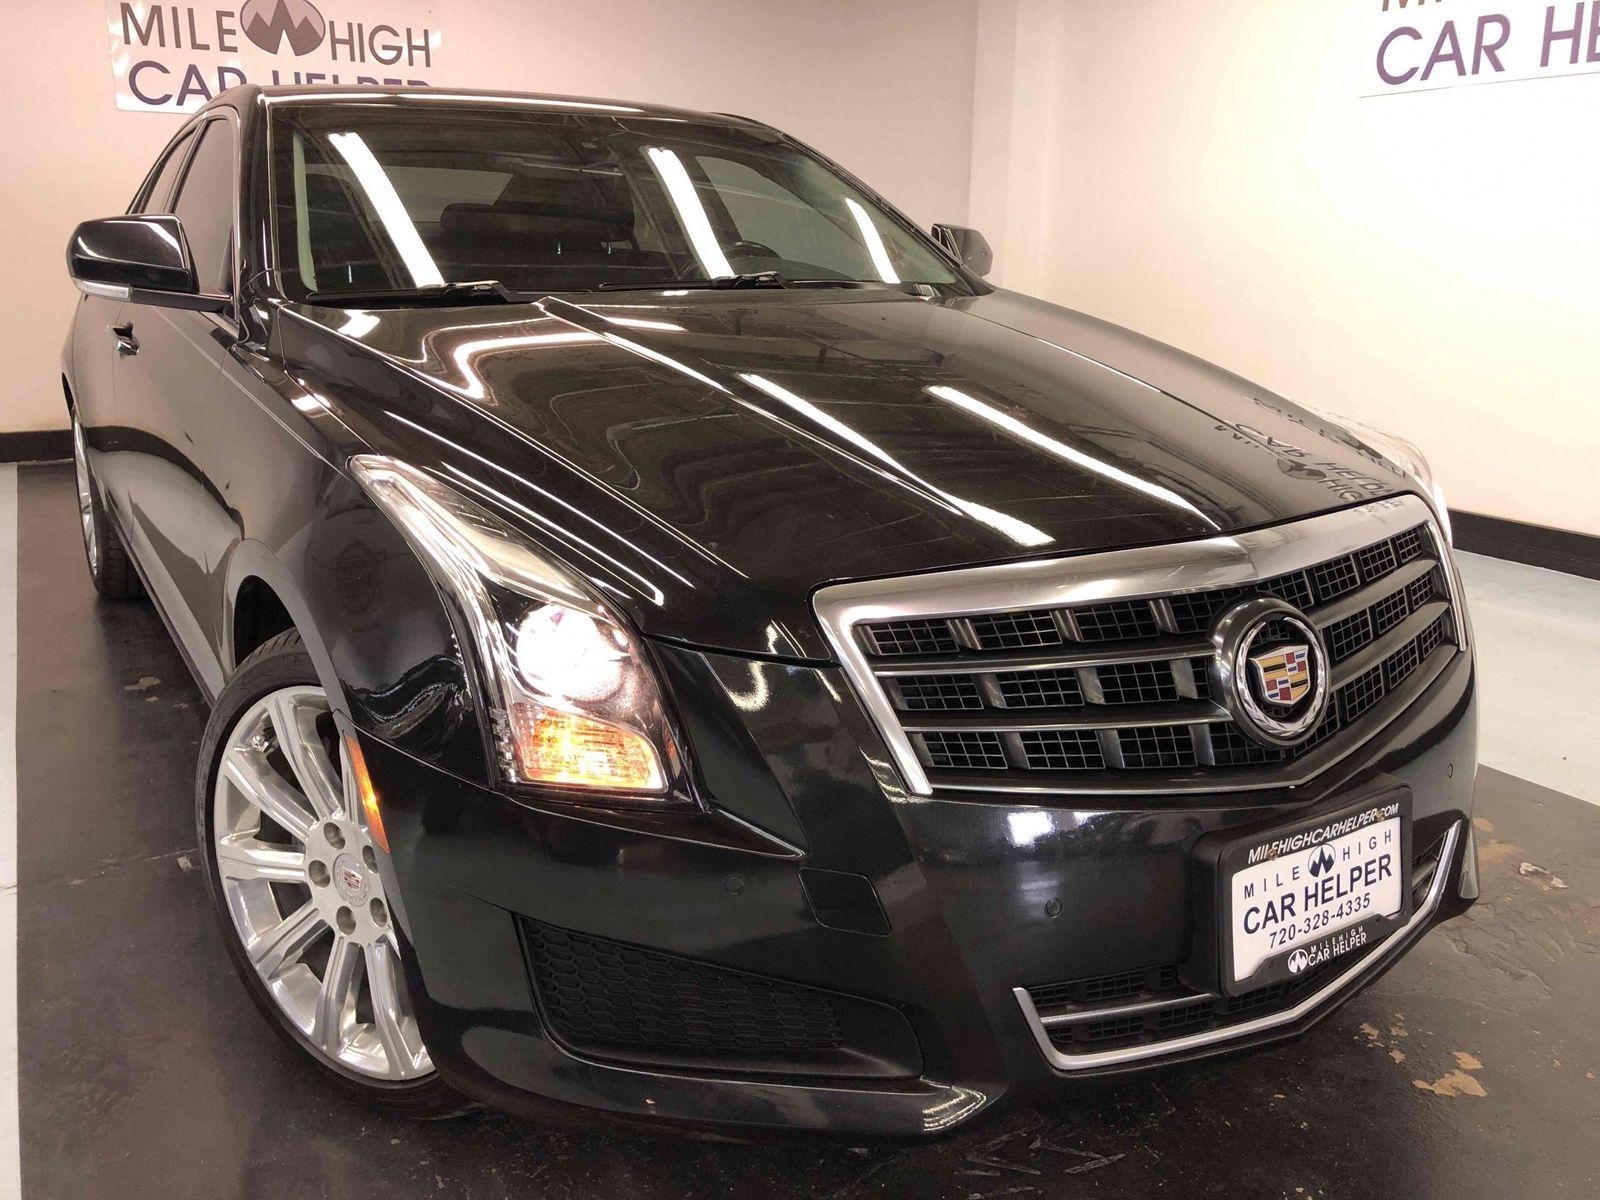 2013 Cadillac ATS 3 6L Luxury | Mile High Car Helper